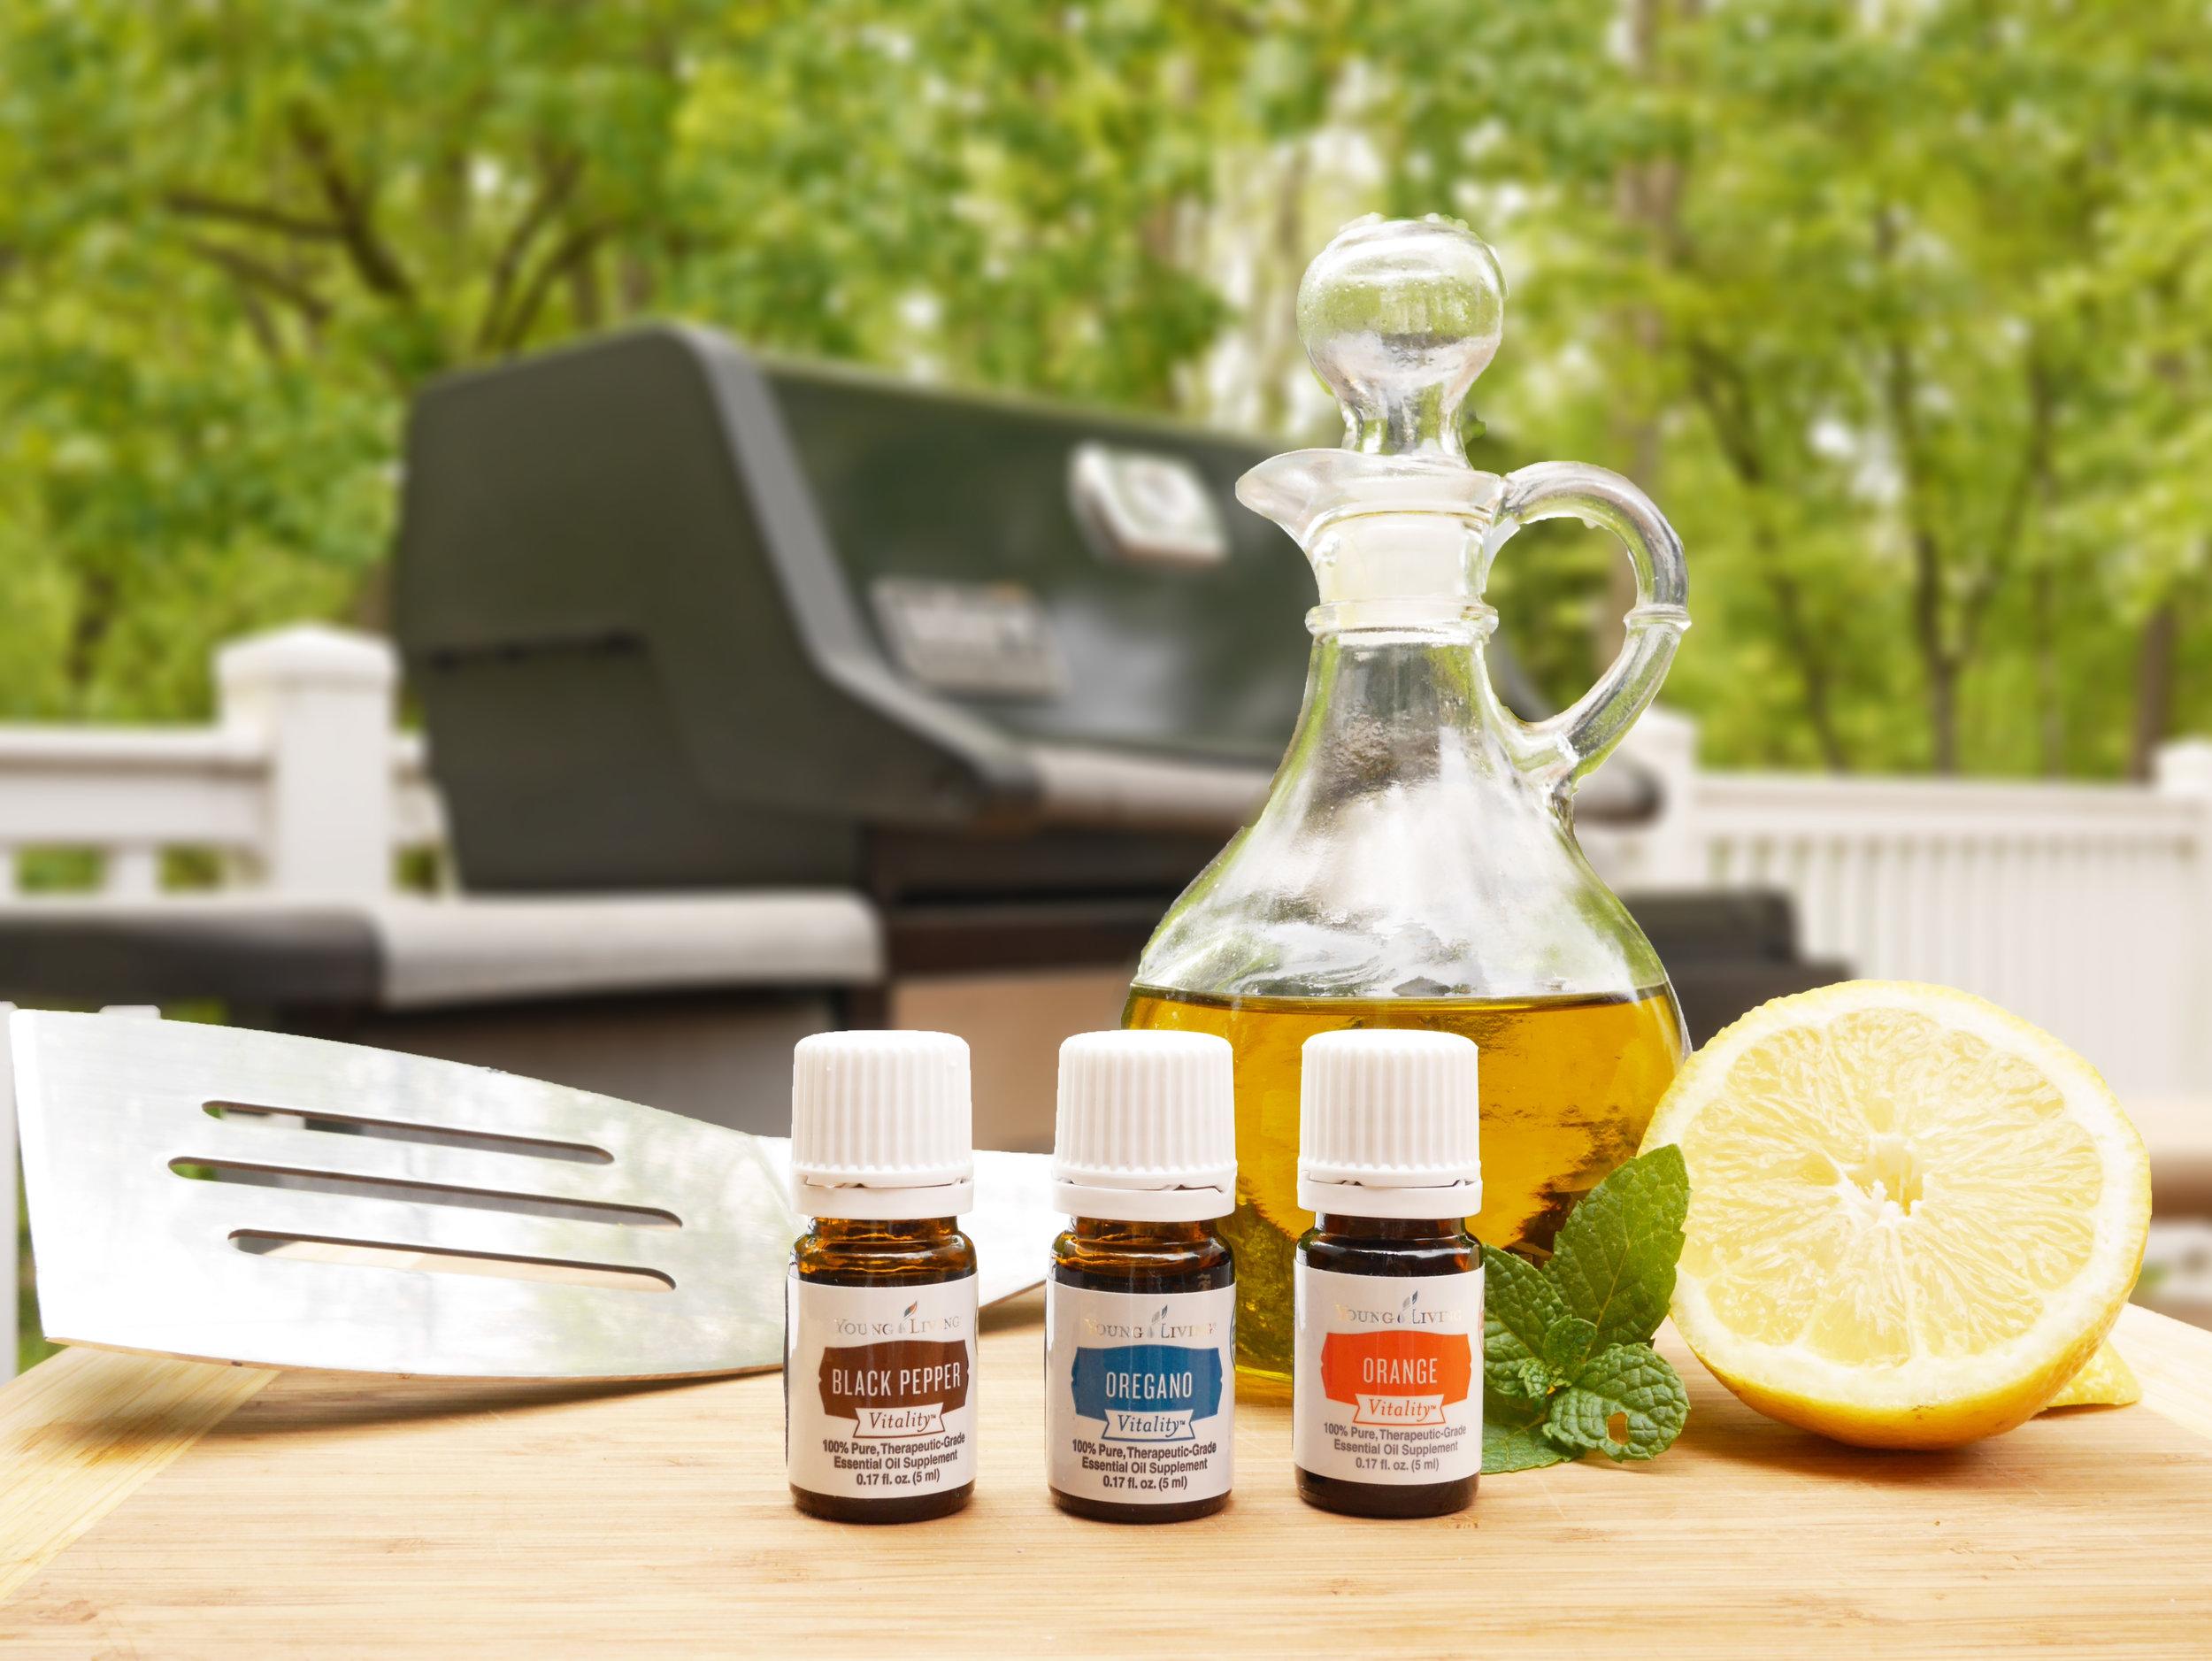 Tangy-Summer-Marinade-Tamari-Sauce-Red-Wine-Vinegar-Garlic-Oregano-Orange-Black-Pepper-Vitality-Essential-Oil-Recipe Recipe.jpeg